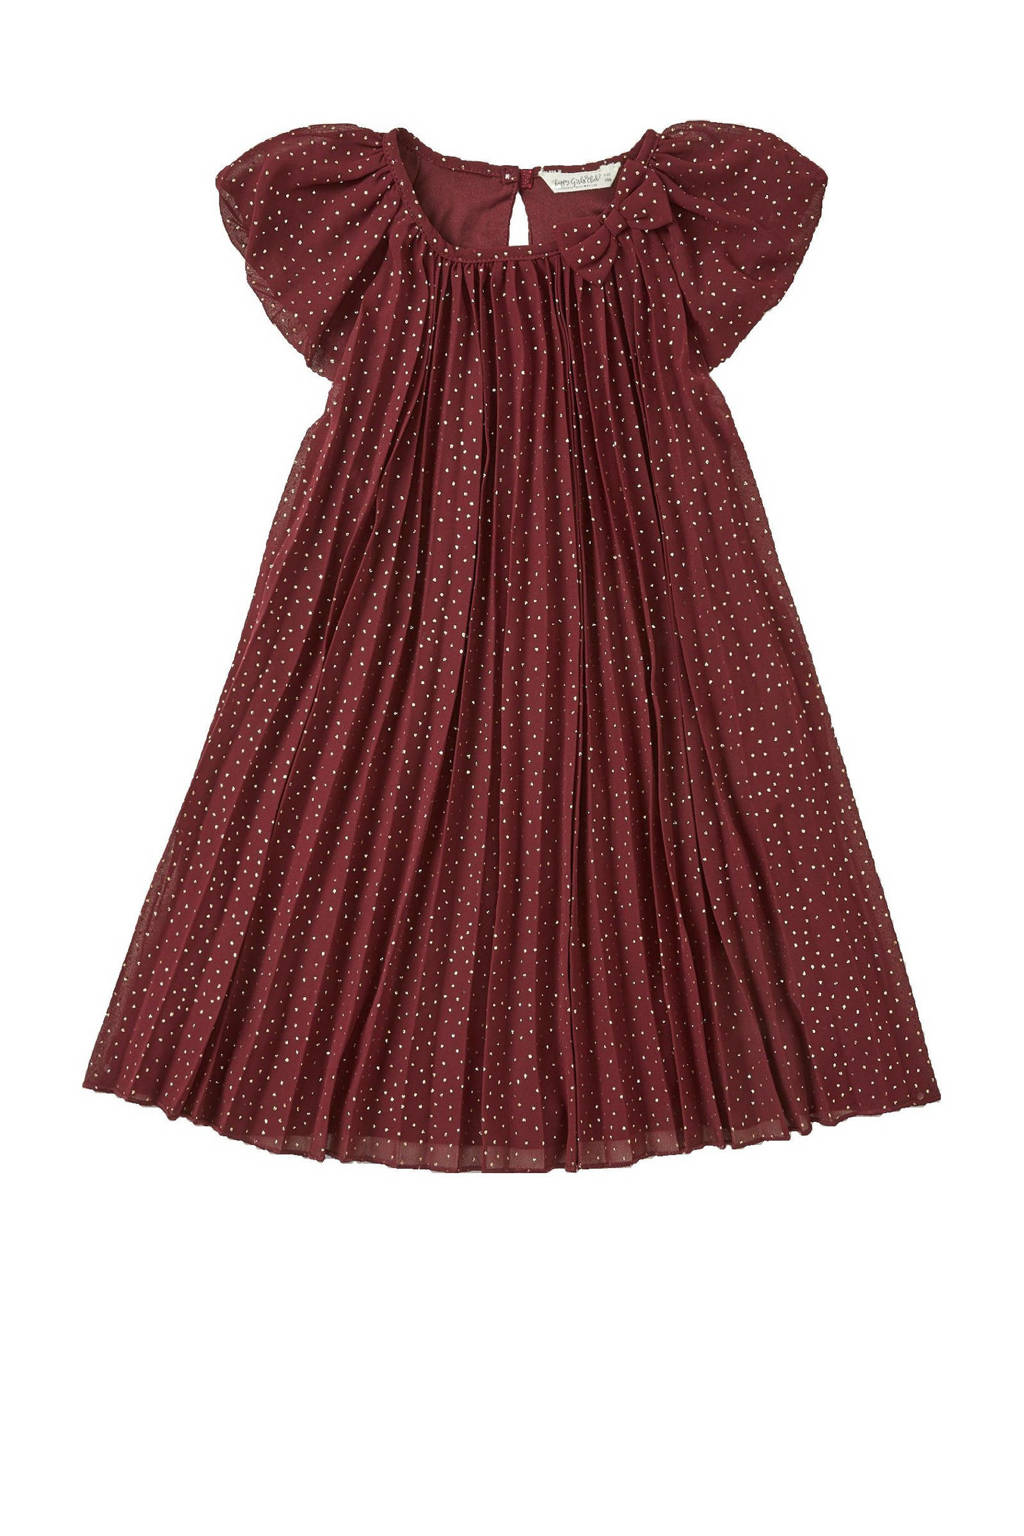 C&A Palomino plisse jurk met stippen en ruches donkerrood/wit, Donkerrood/wit